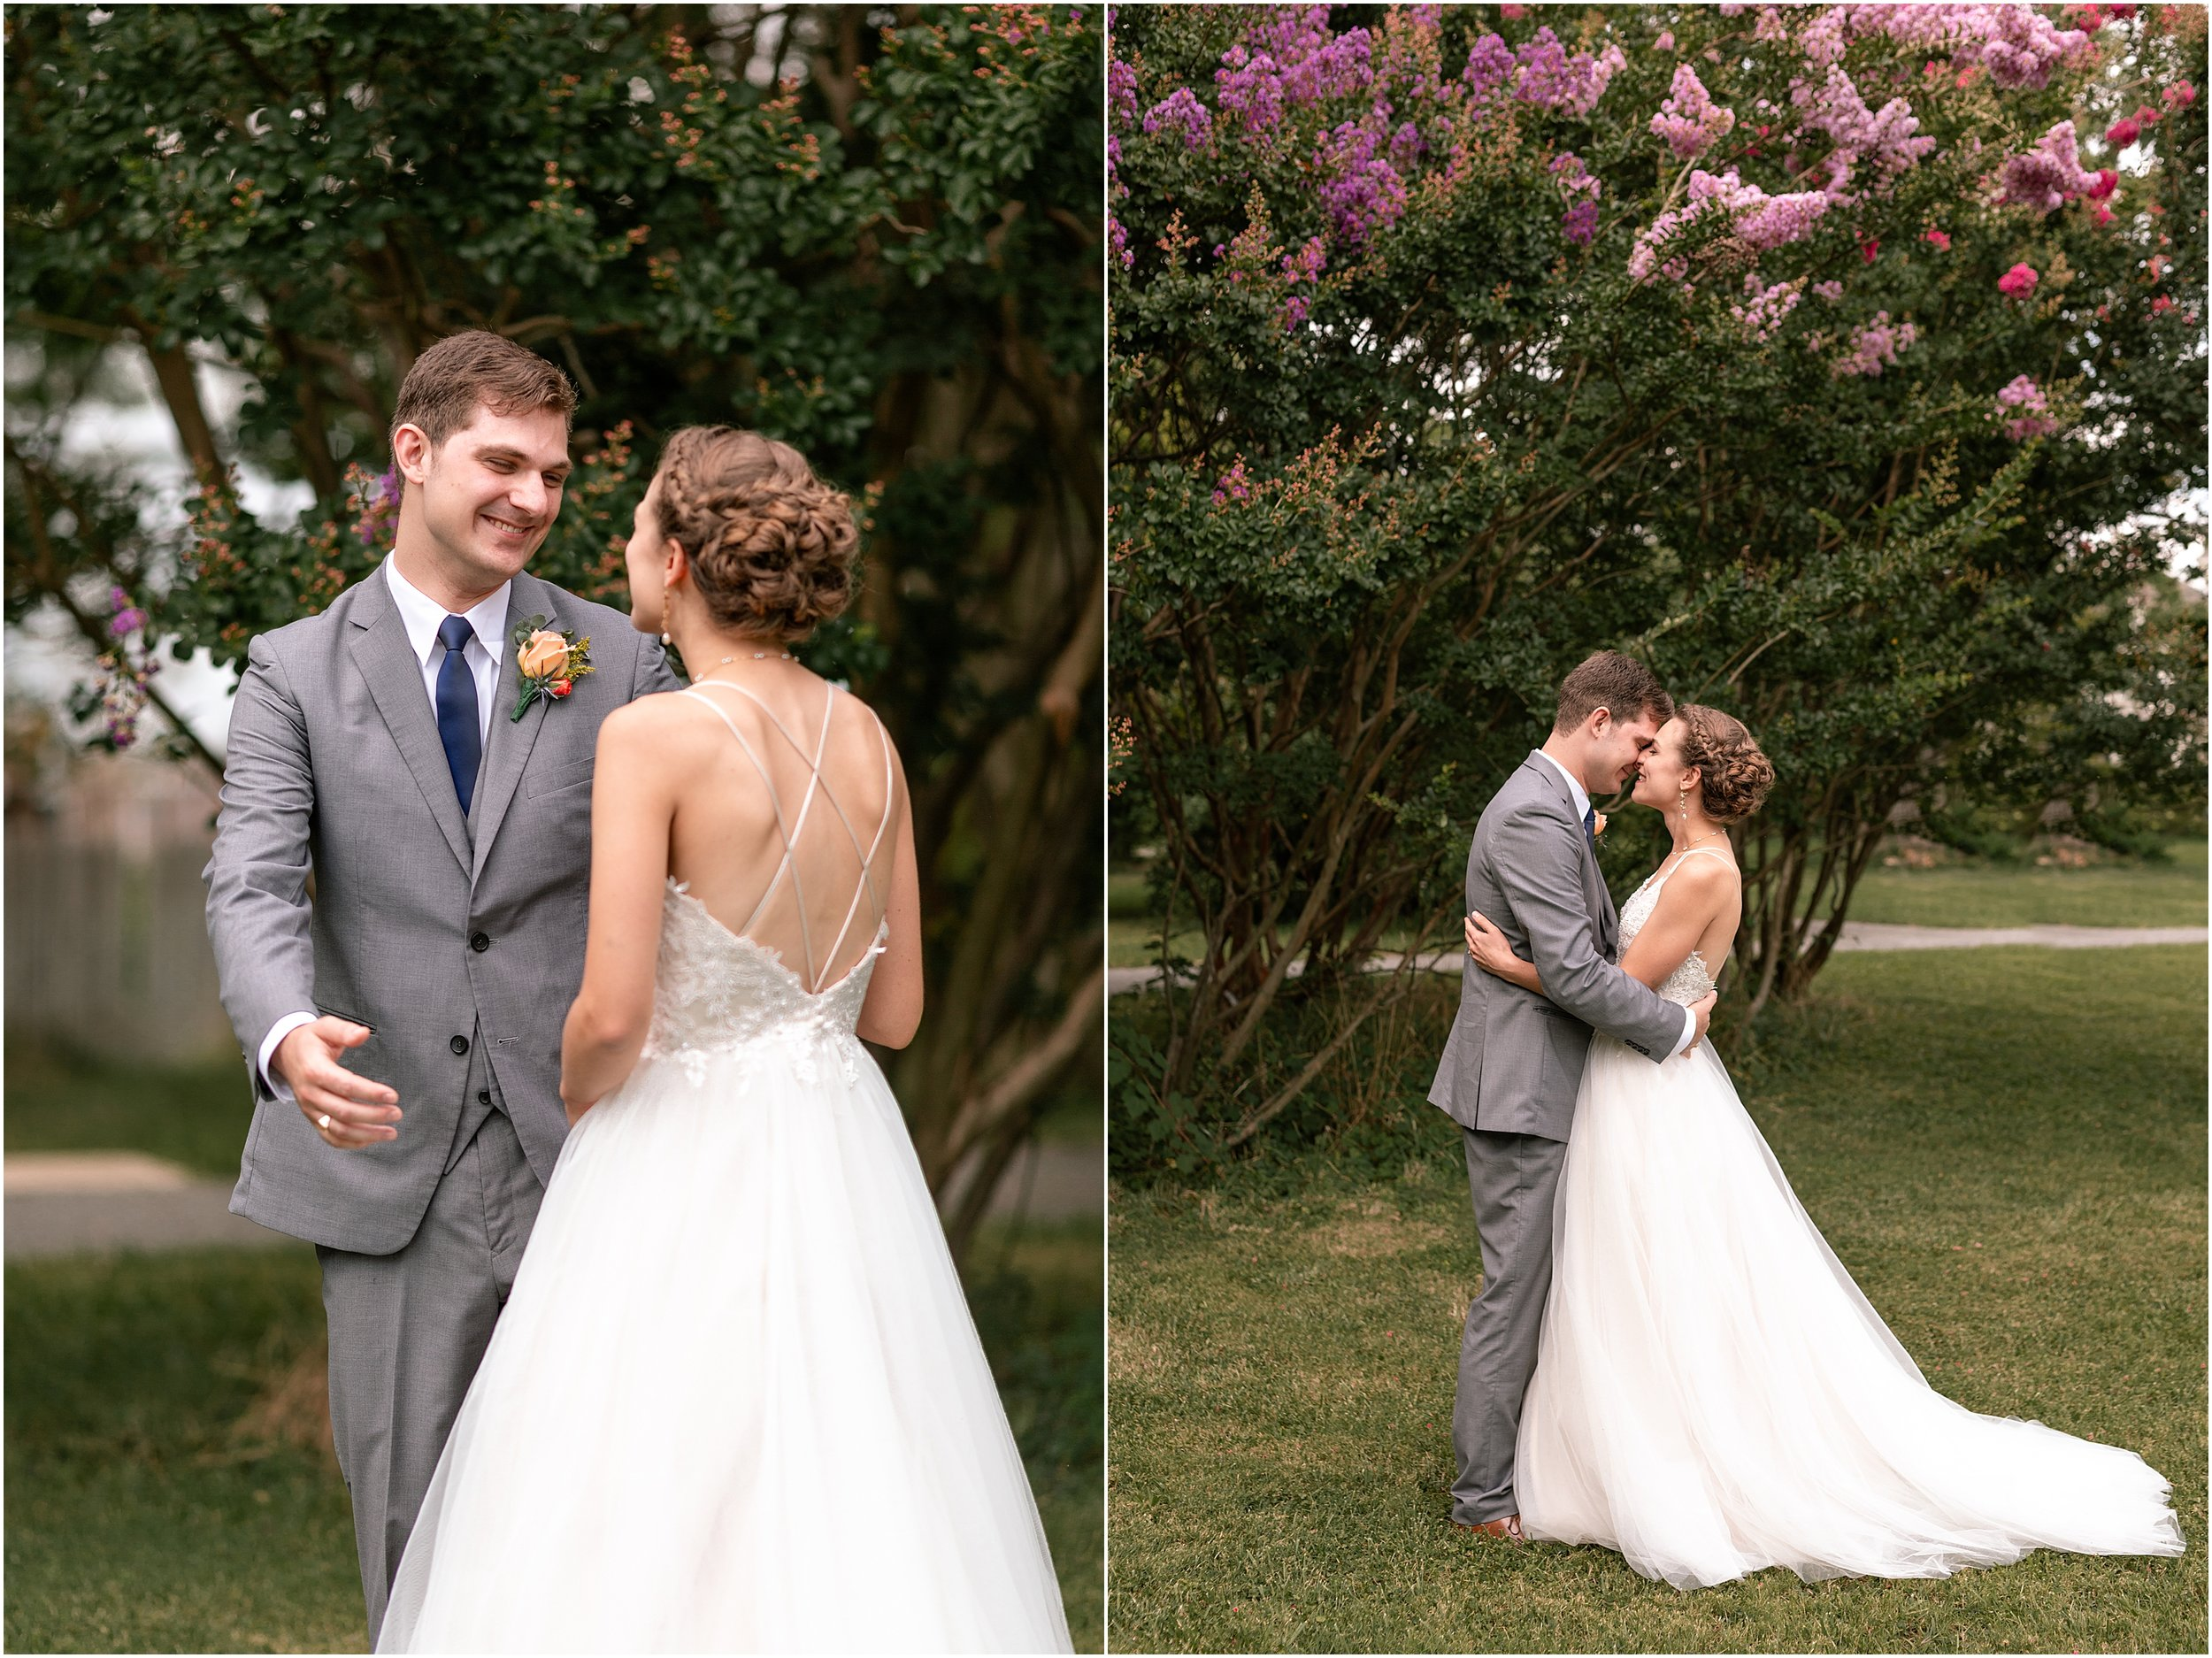 hannah leigh photography Cylburn Arboretum Wedding Baltimore, MD_3404.jpg